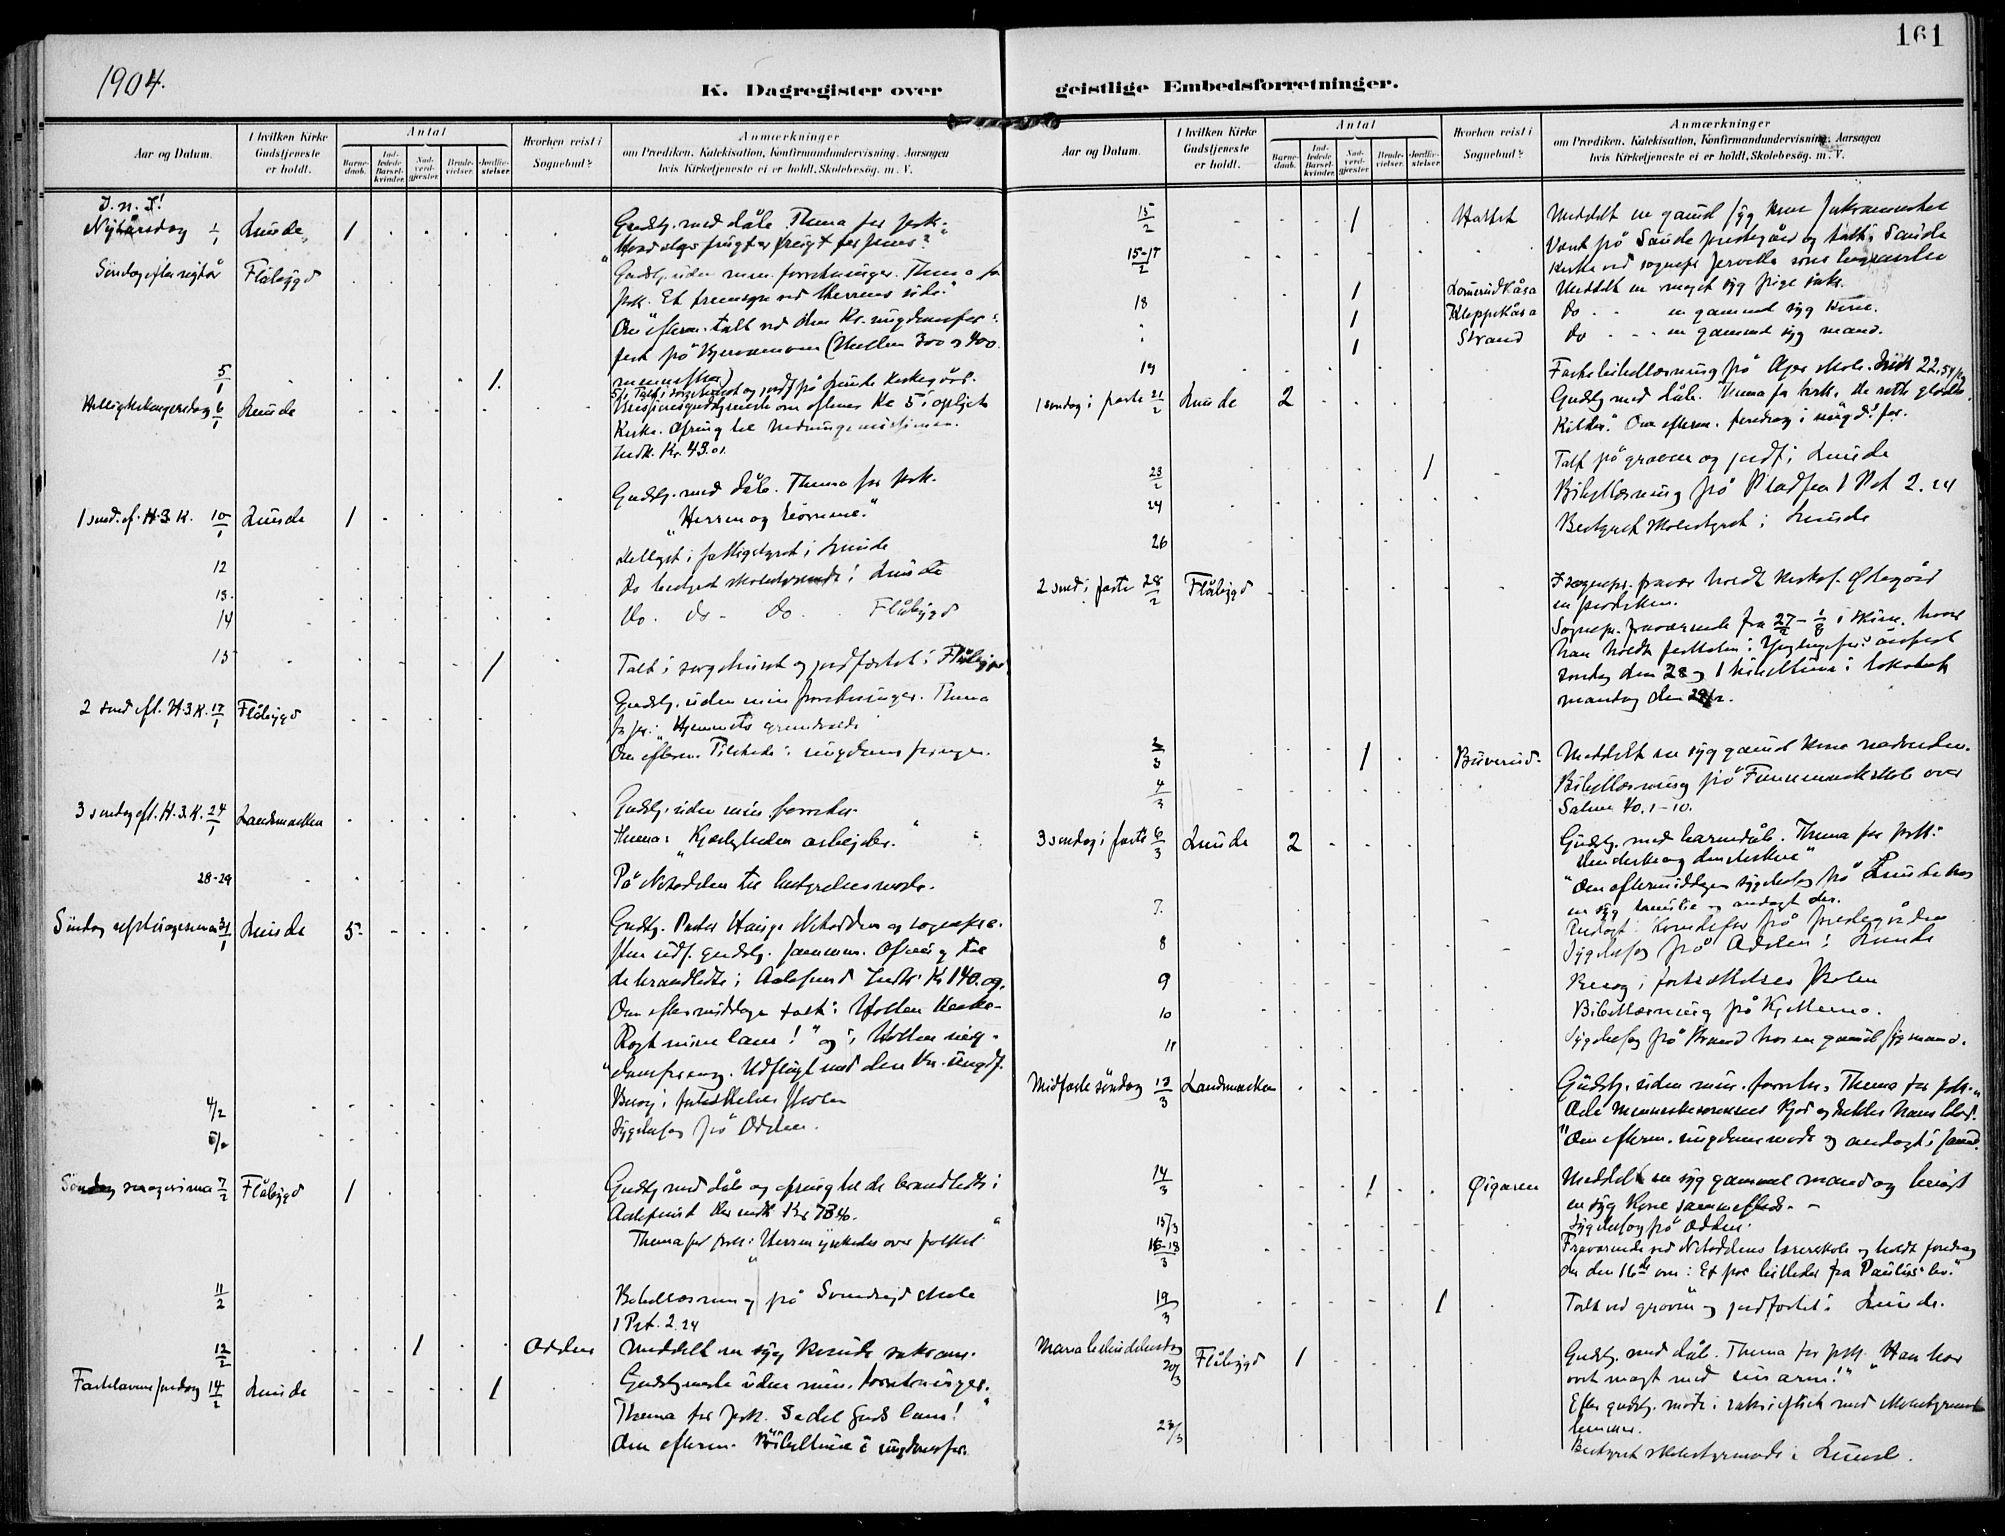 SAKO, Lunde kirkebøker, F/Fa/L0004: Ministerialbok nr. I 4, 1902-1913, s. 161